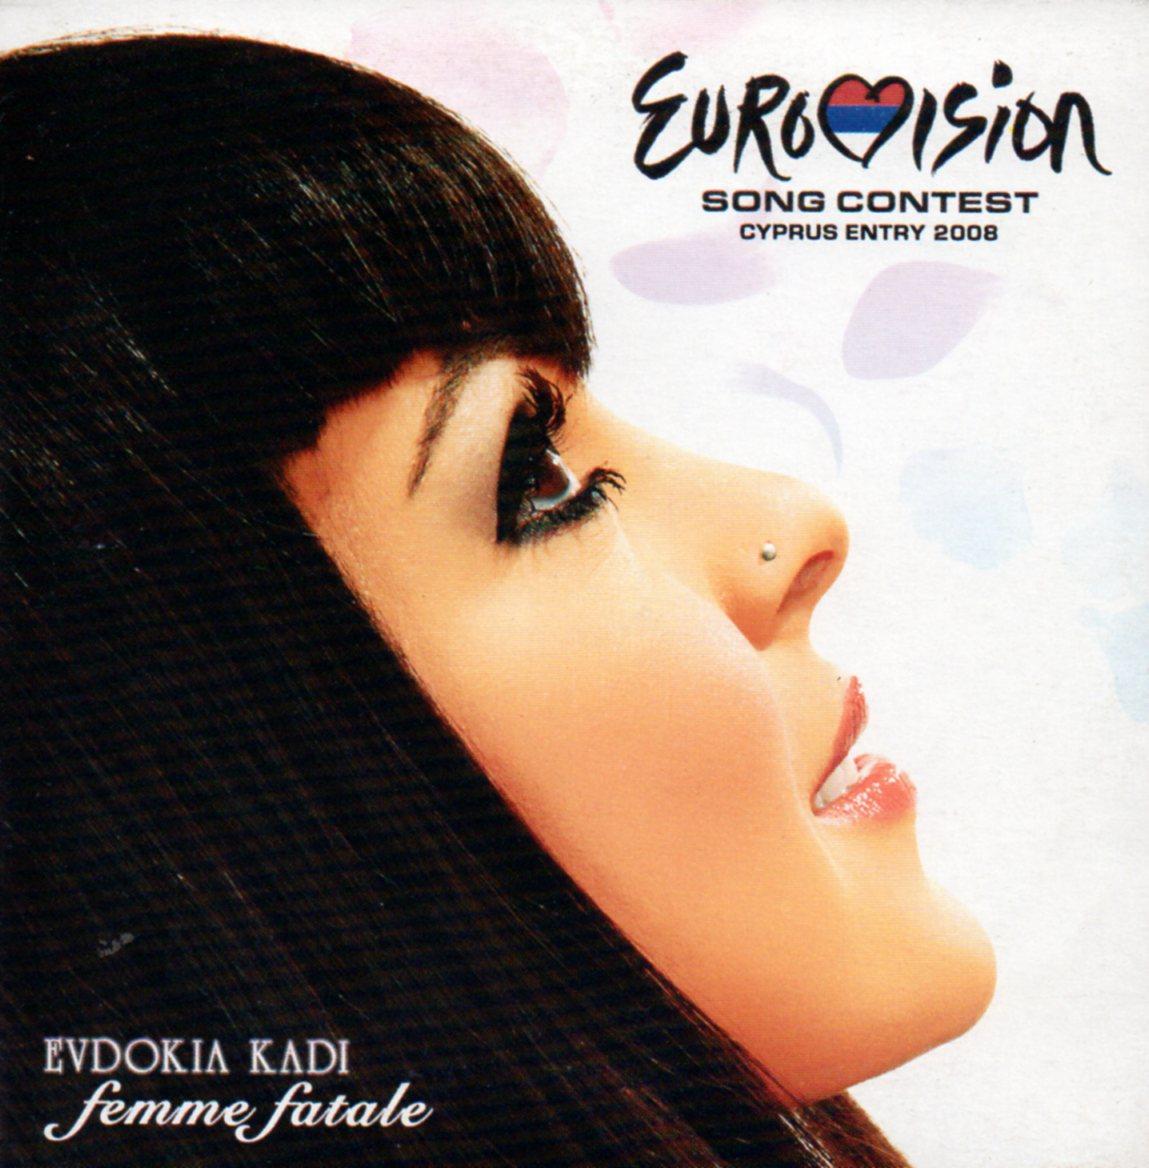 EUROVISION 2008 CHYPRE : EVDOKIA KADI - Femme Fatale 5-track CARD SLEEVE - CD single